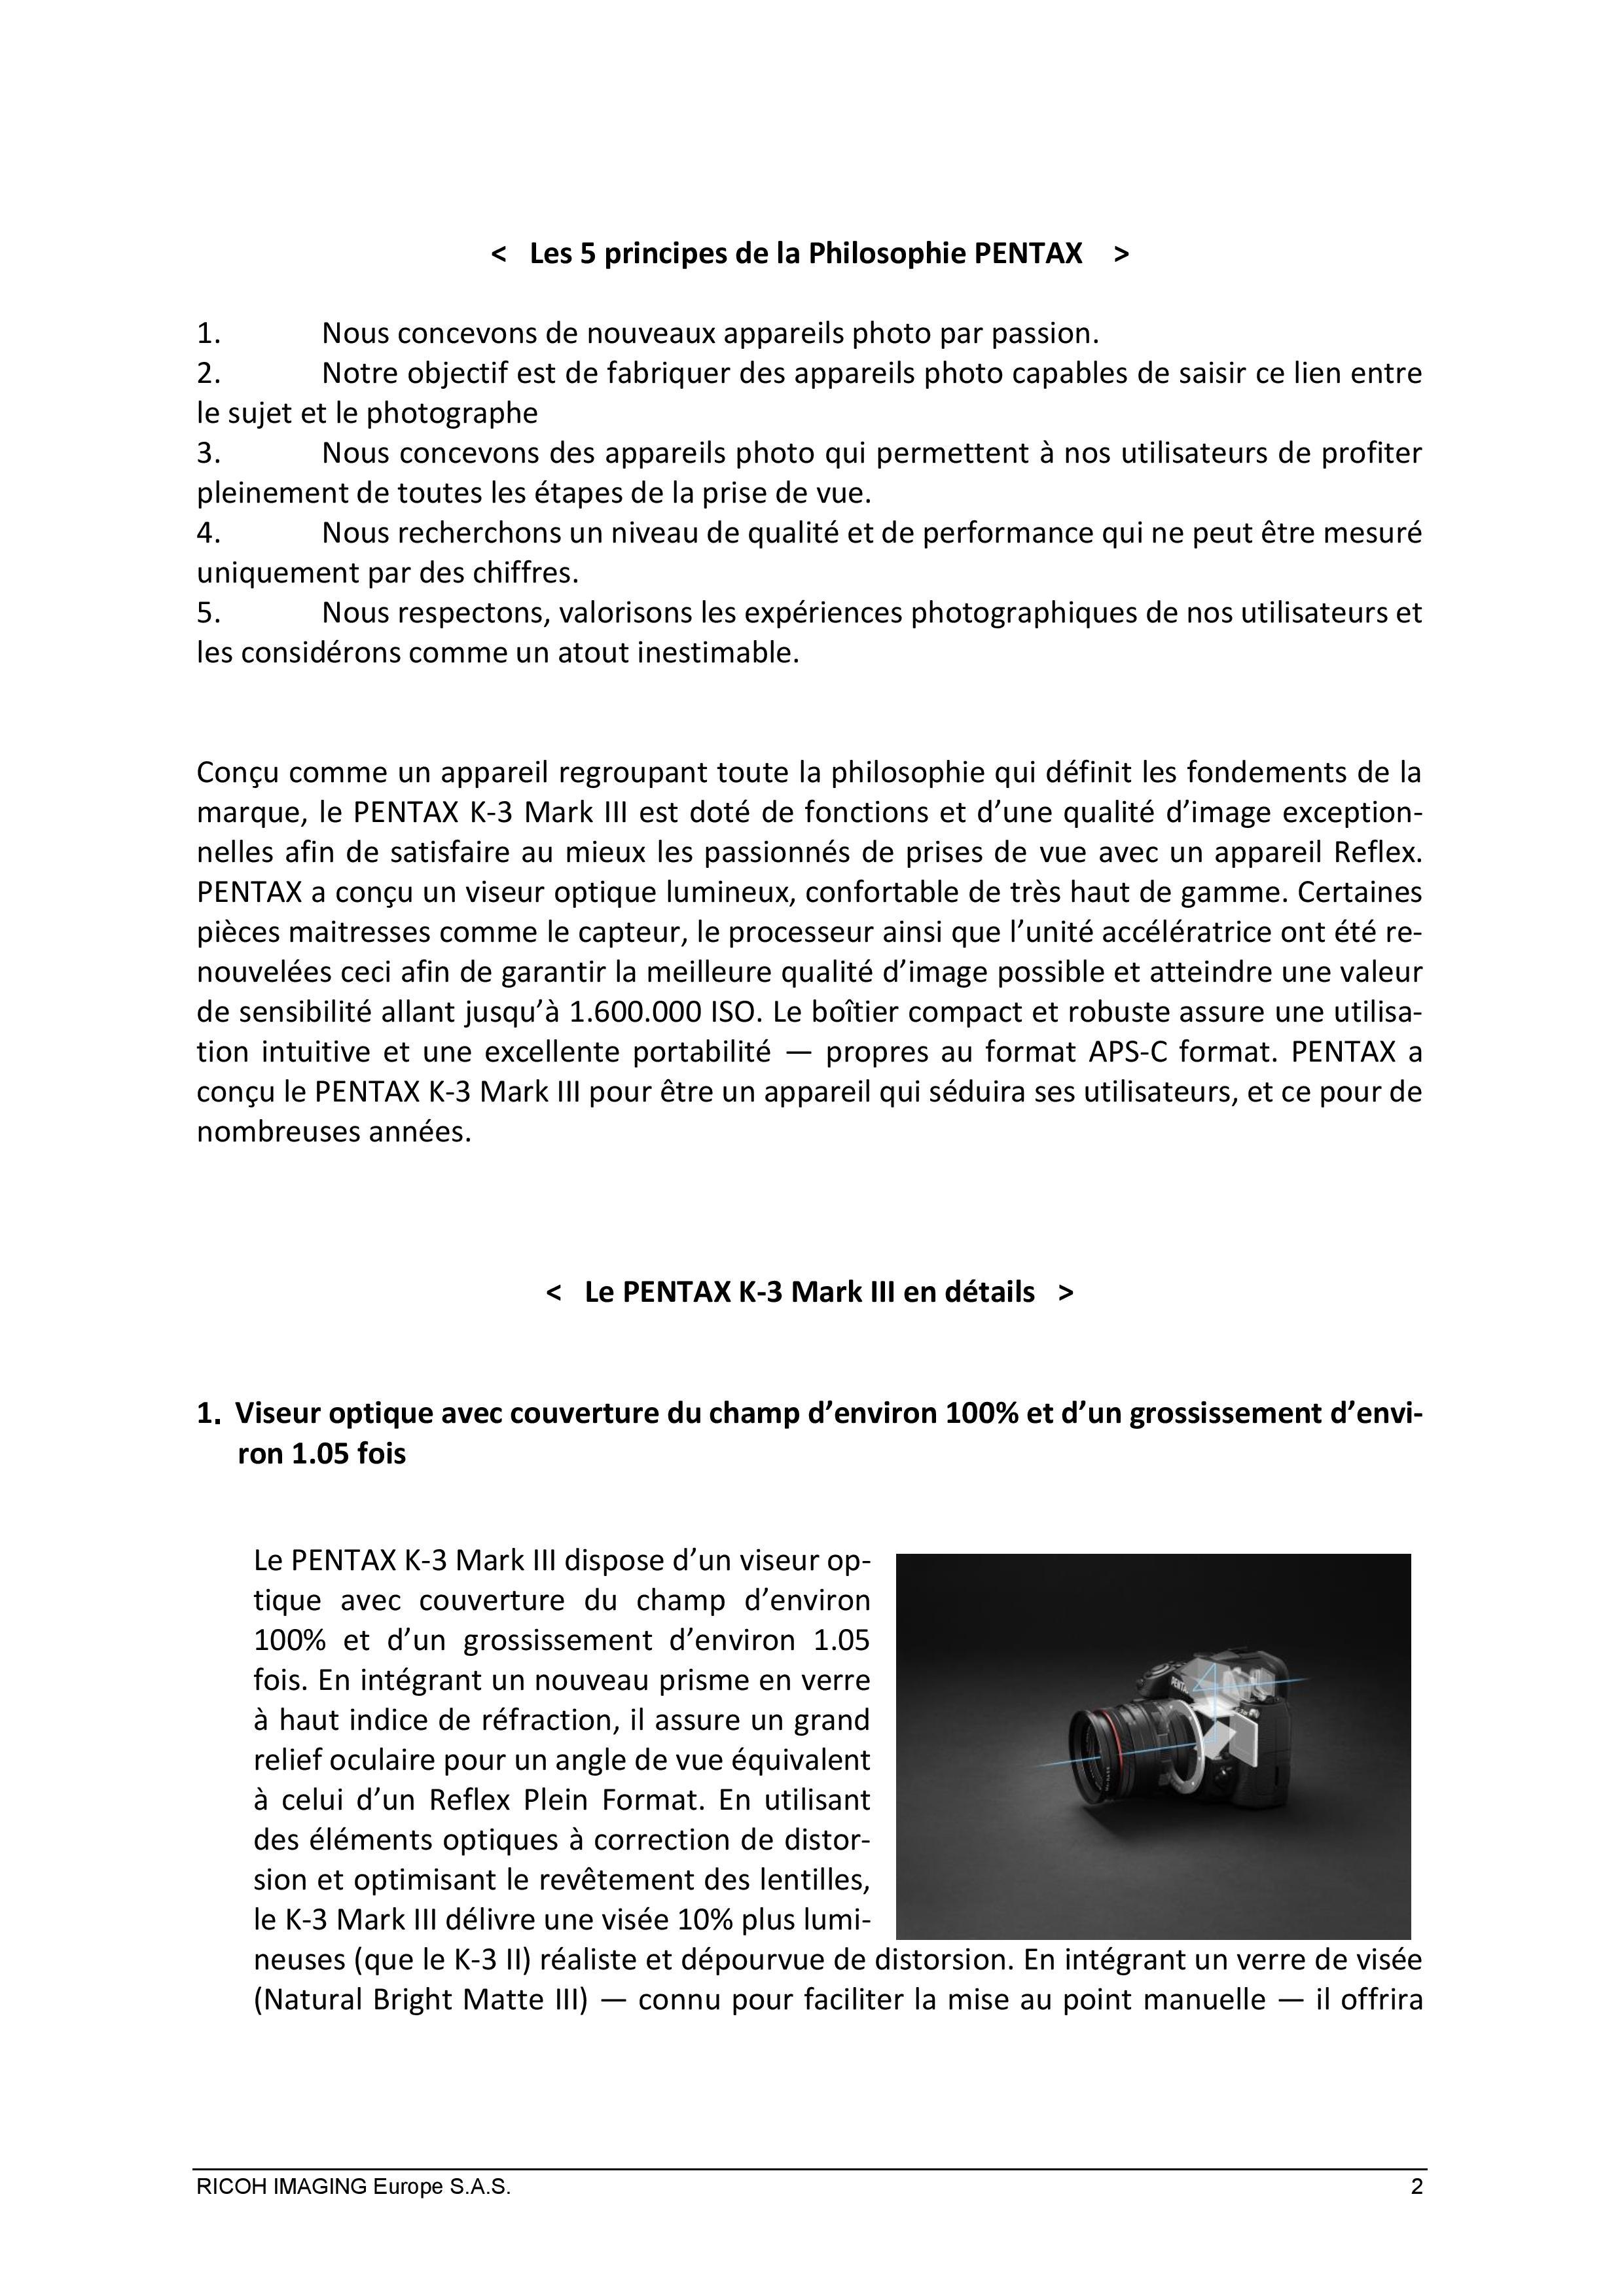 PENTAX RICOH IMAGING - Communiqué de presse du K3 Mark III 21033103133323142217344183